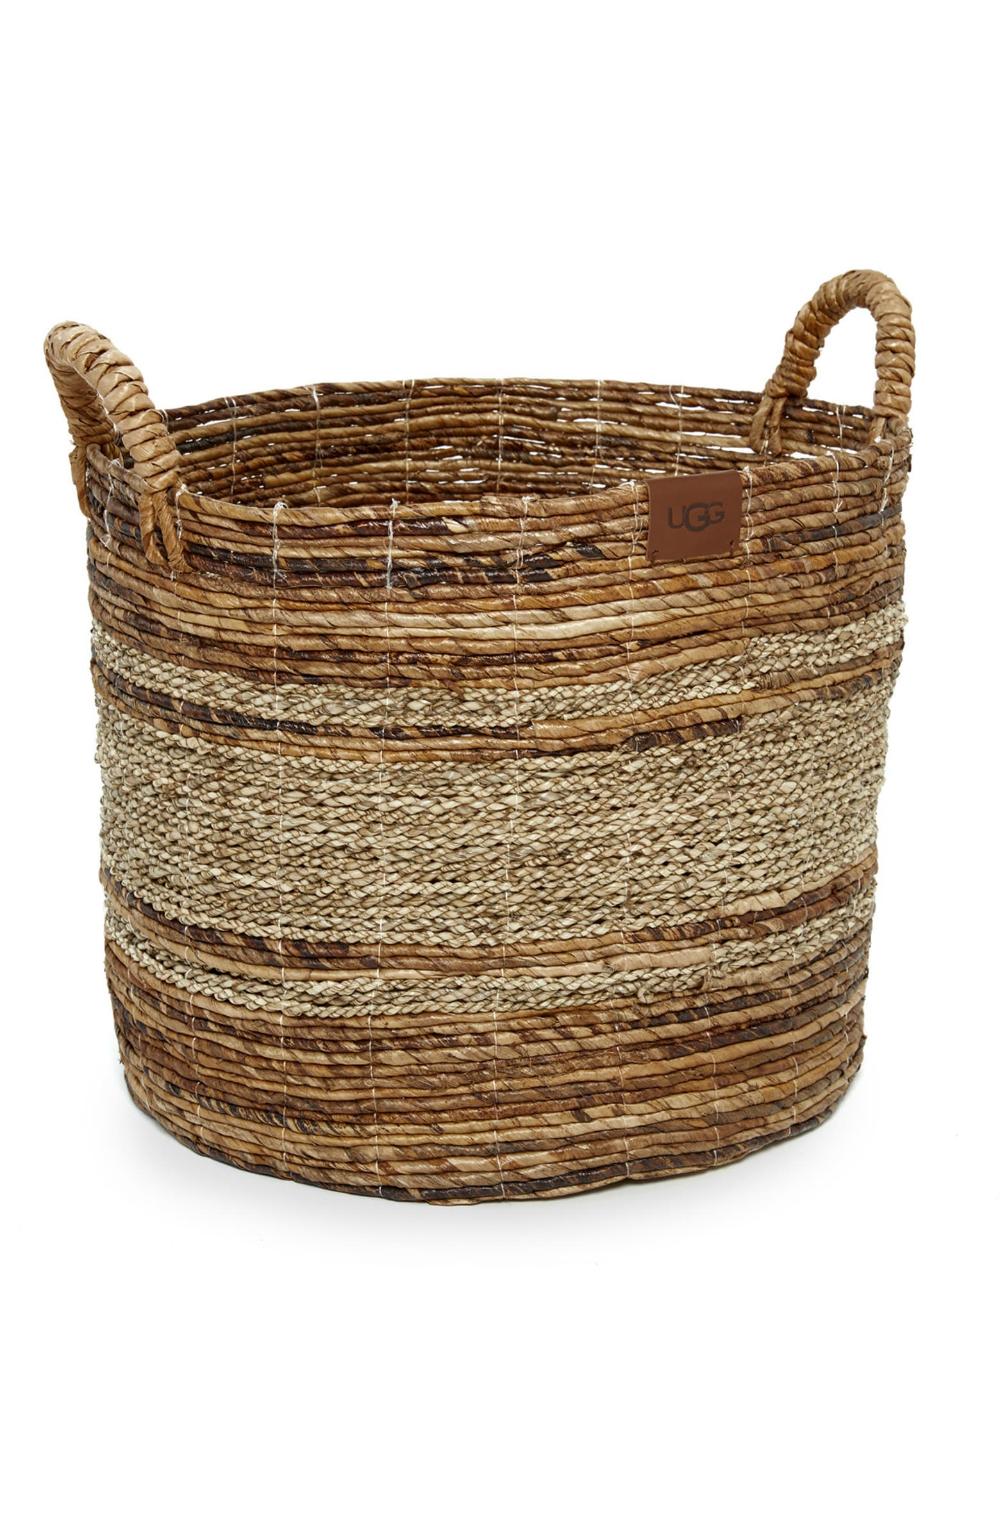 ugg baskets